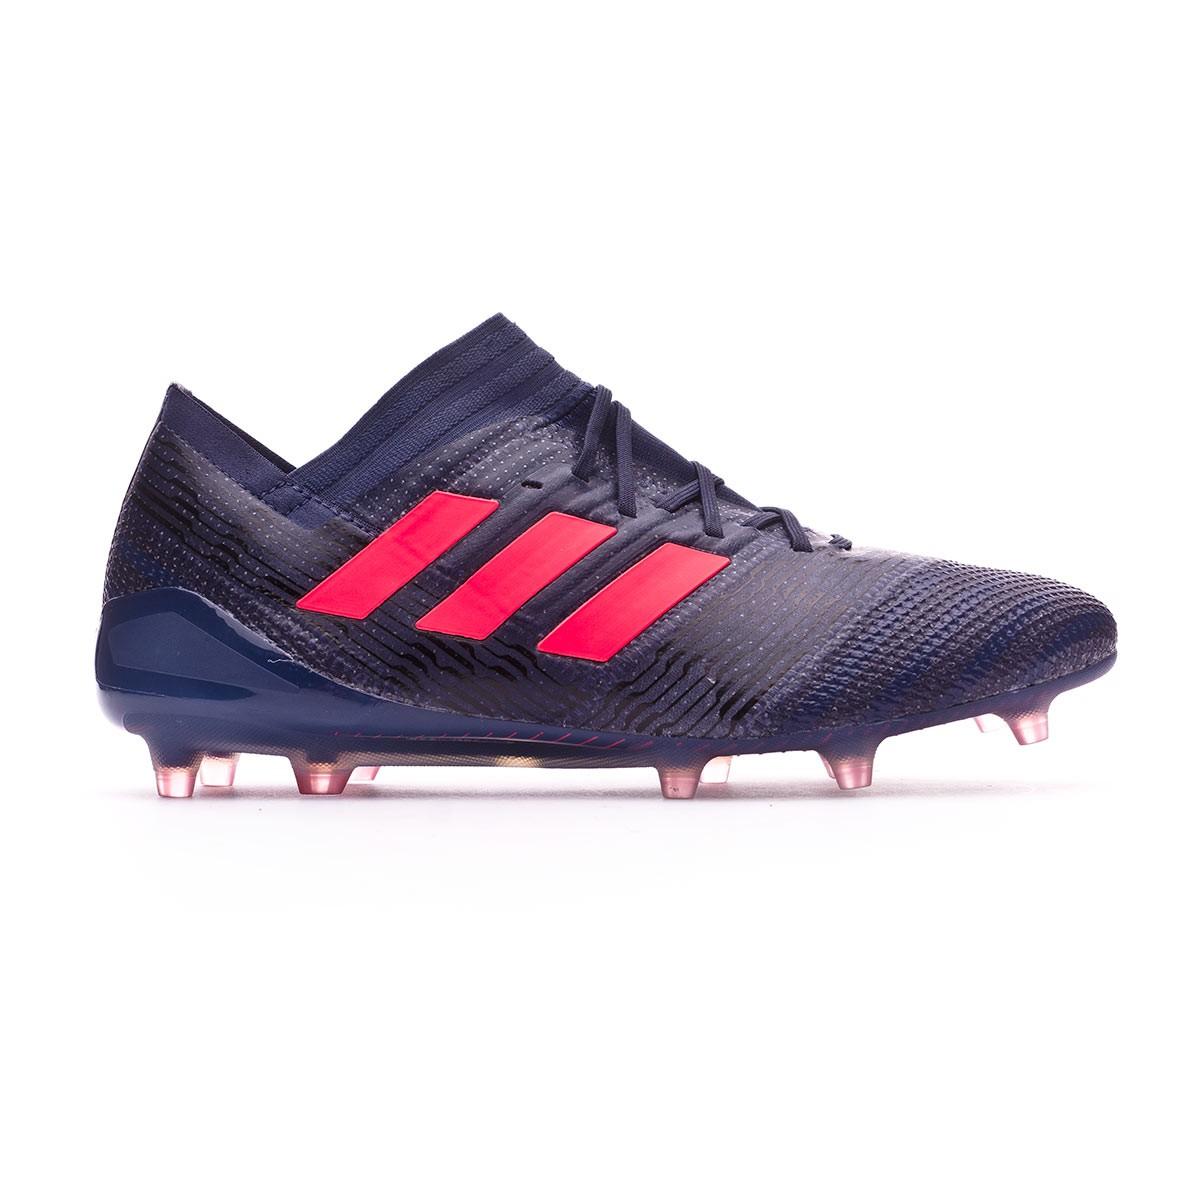 size 40 93a08 1f4da Boot adidas Woman Nemeziz 17.1 FG Trace blue-Red zest-Core black - Football  store Fútbol Emotion